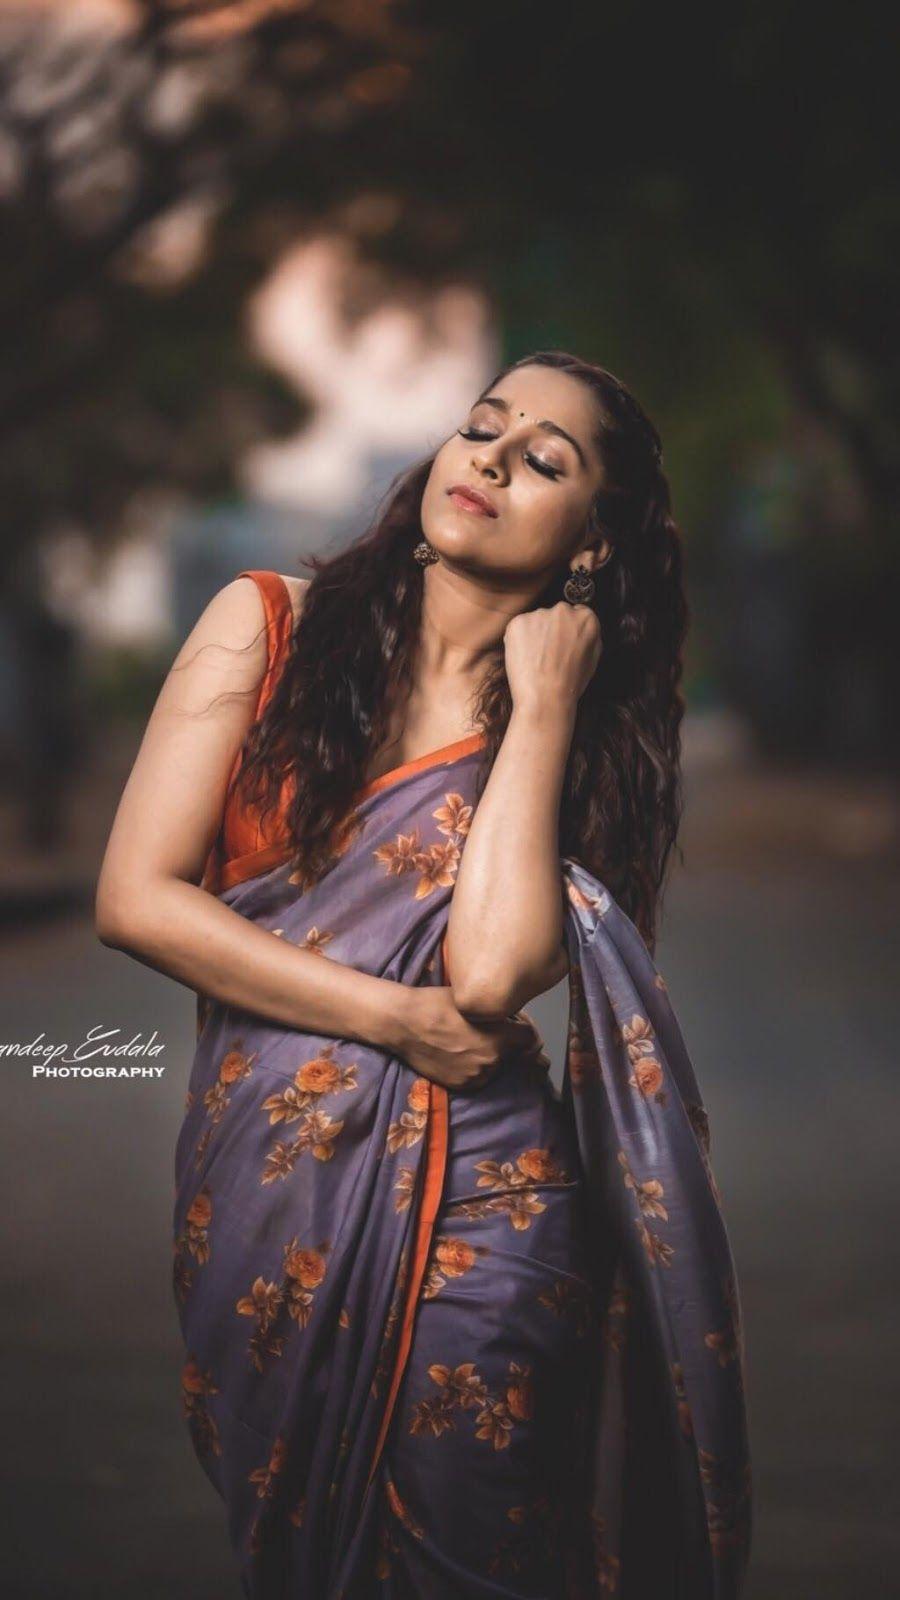 Indian Tv Model Rashmi Gautam Hot In Sleeveless Blue Saree Indian Photoshoot Saree Photoshoot Girl Photography Poses Prosmotrov 138 tys.4 mesyaca nazad. indian photoshoot saree photoshoot